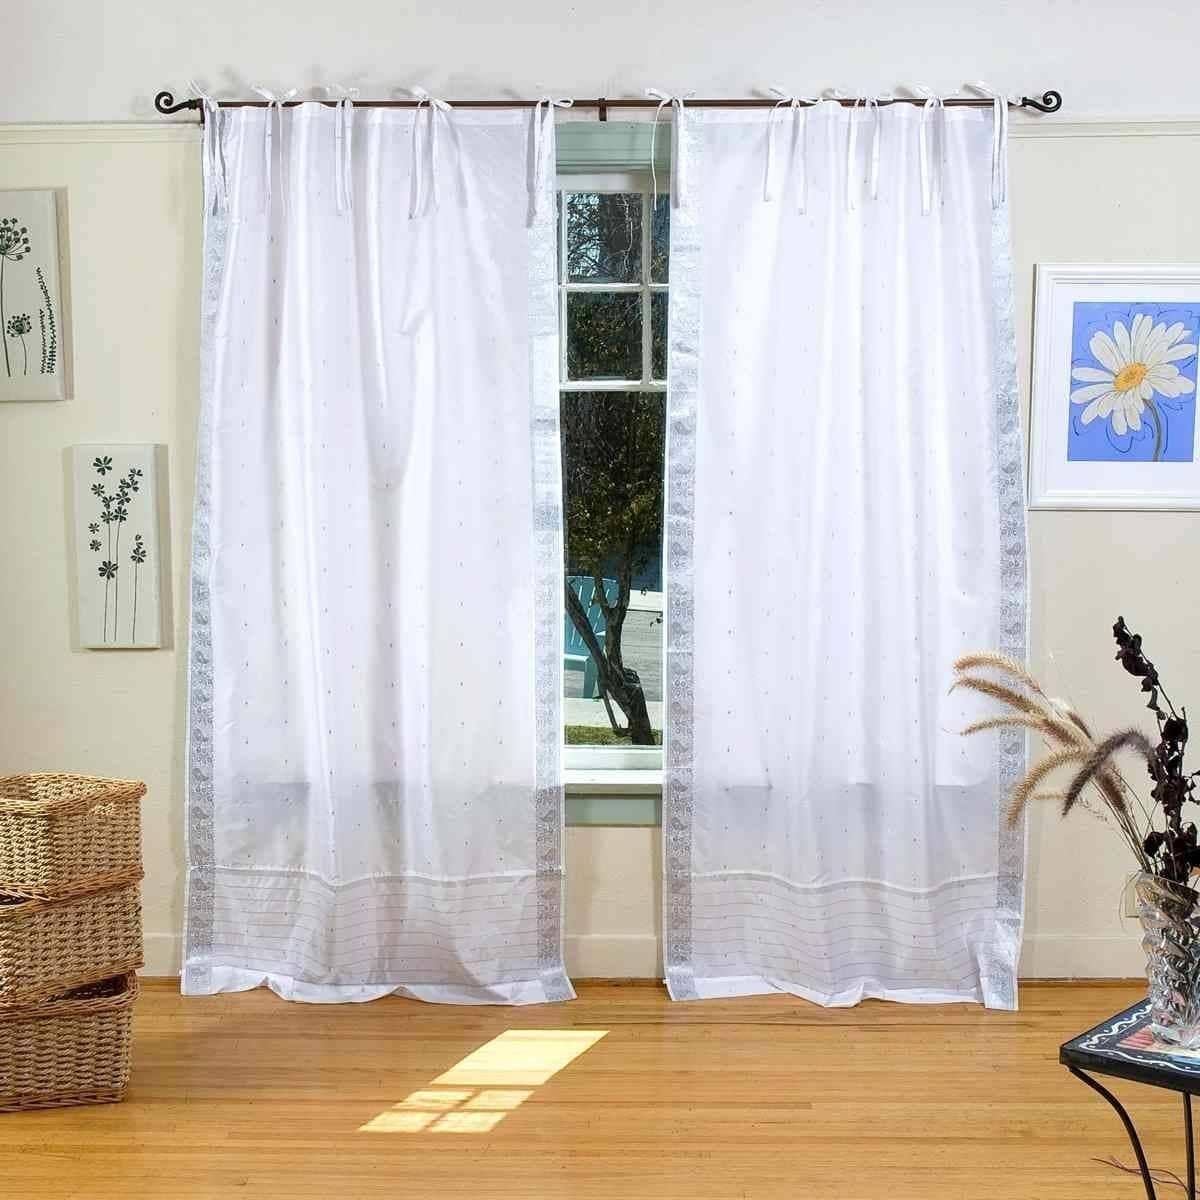 Indian Selections White Silver Tie Top Sheer Sari Curtain Drape